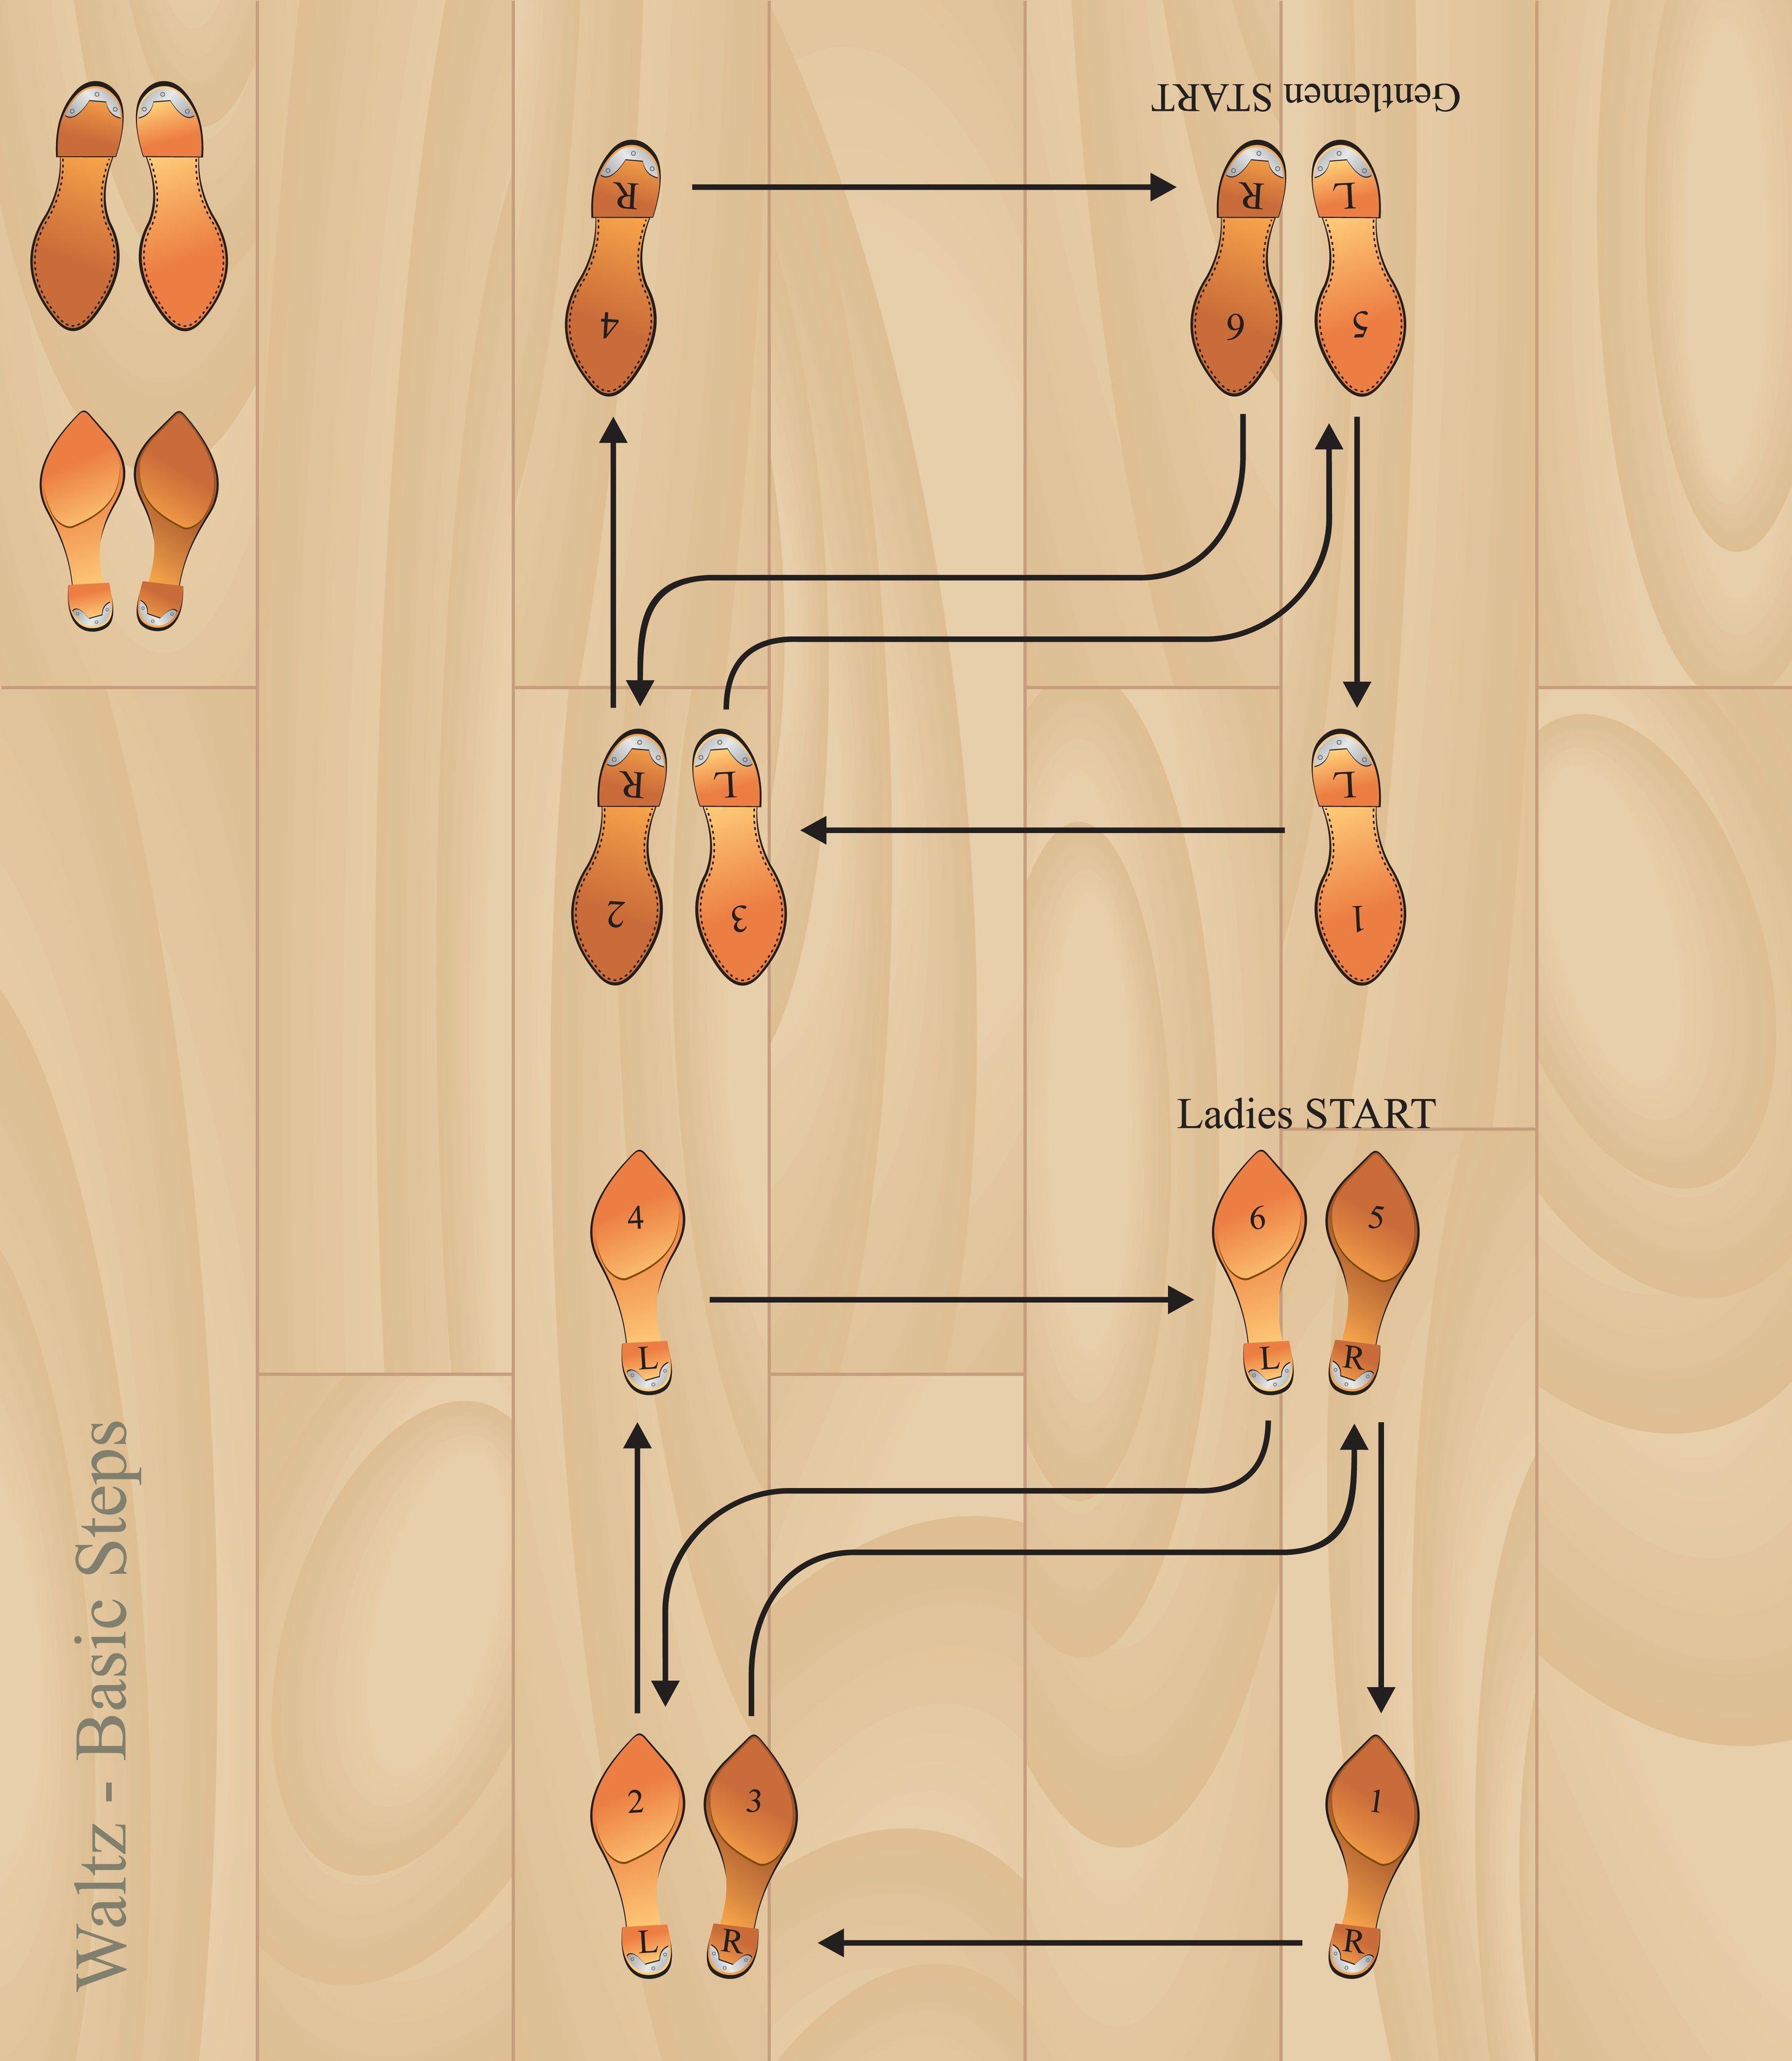 Ab Ac F B F E A B on Country Waltz Dance Steps Diagram